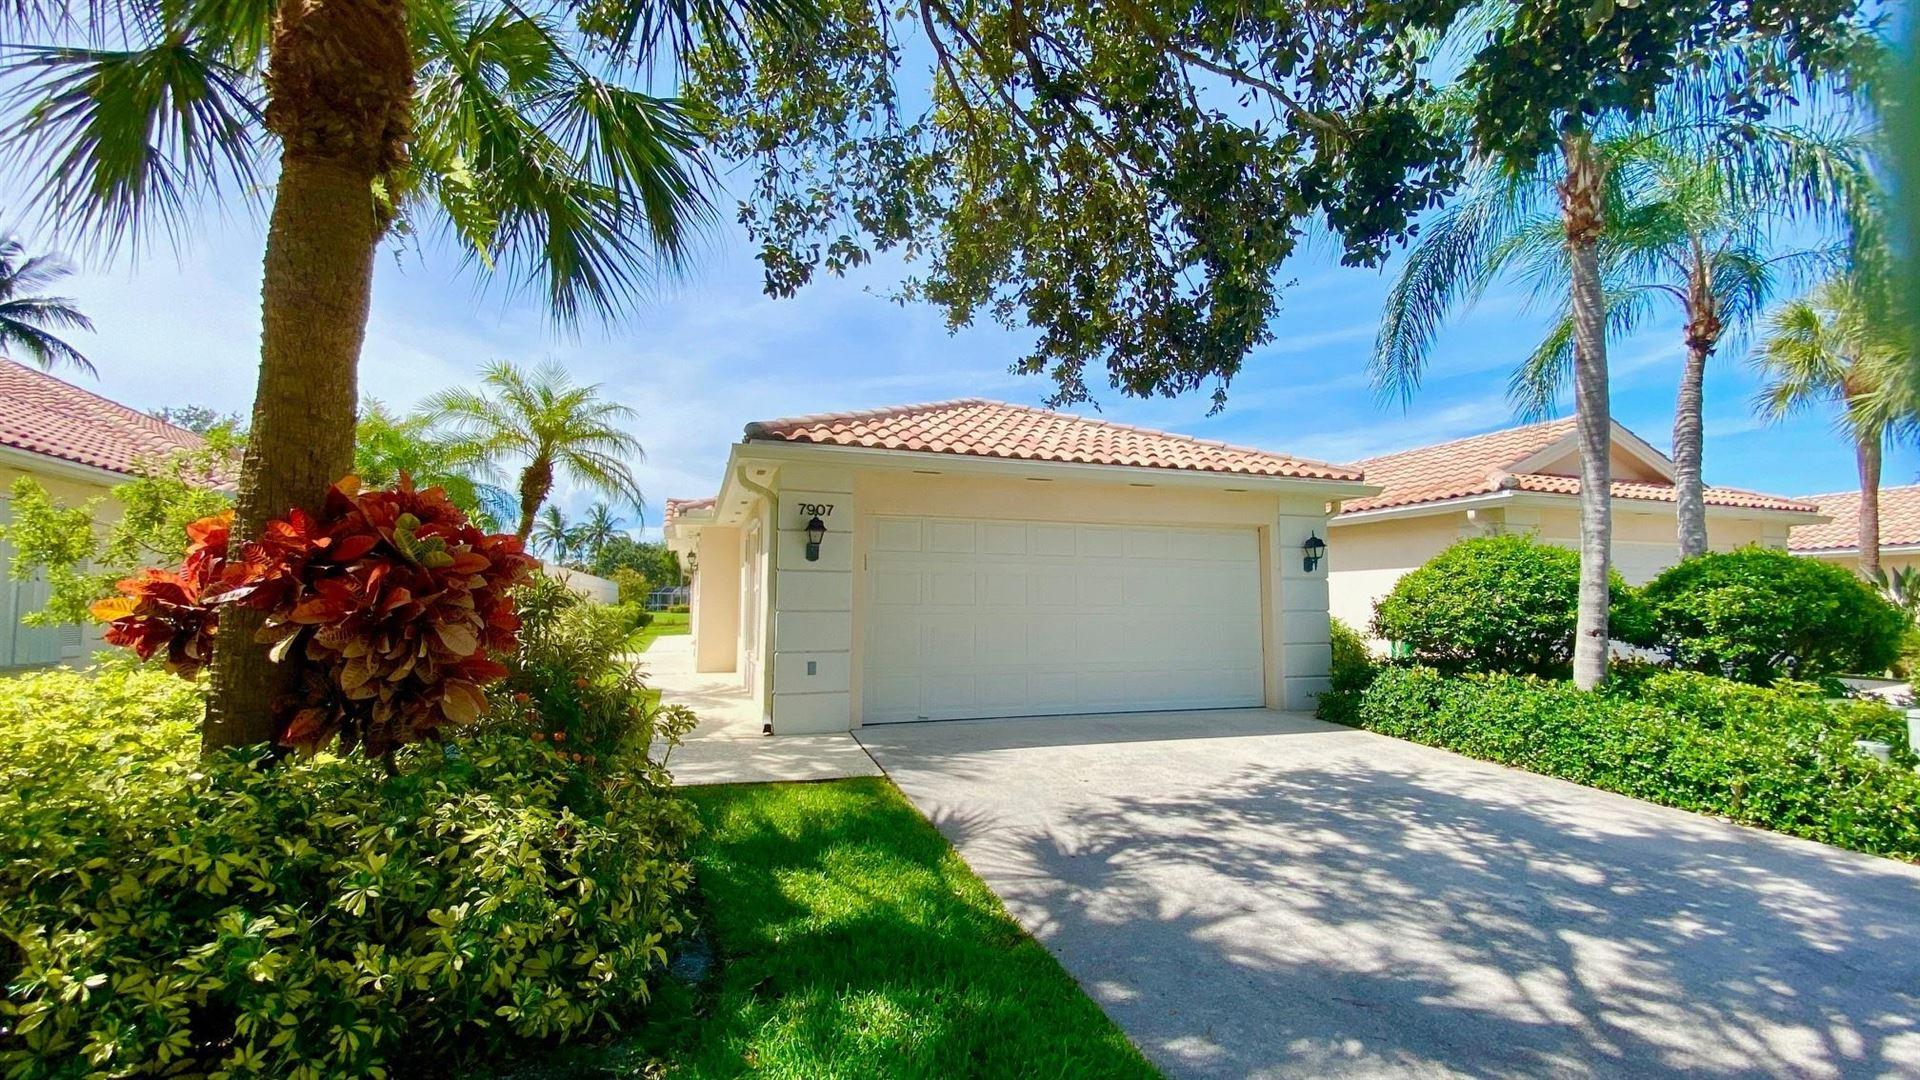 7907 Olympia Drive, West Palm Beach, FL 33411 - #: RX-10639810